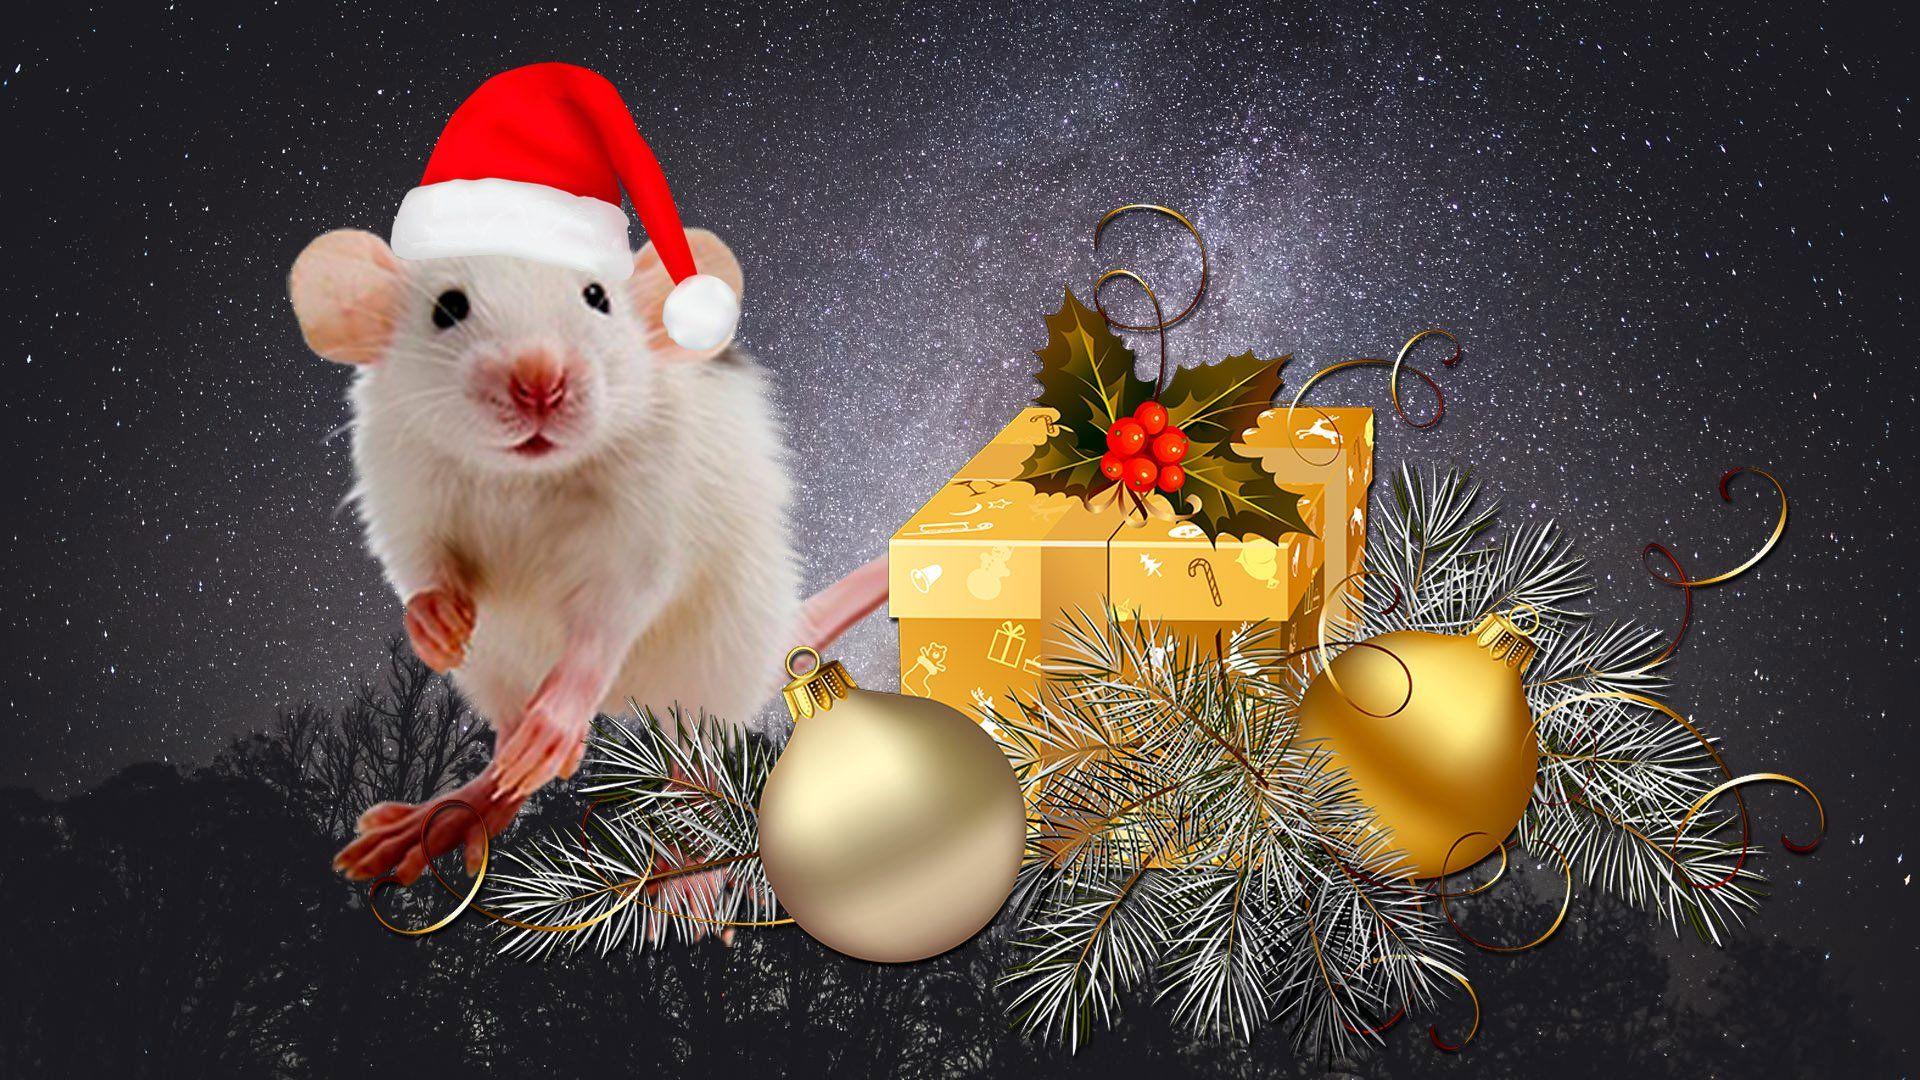 Christmas White Rat Cool Wallpaper